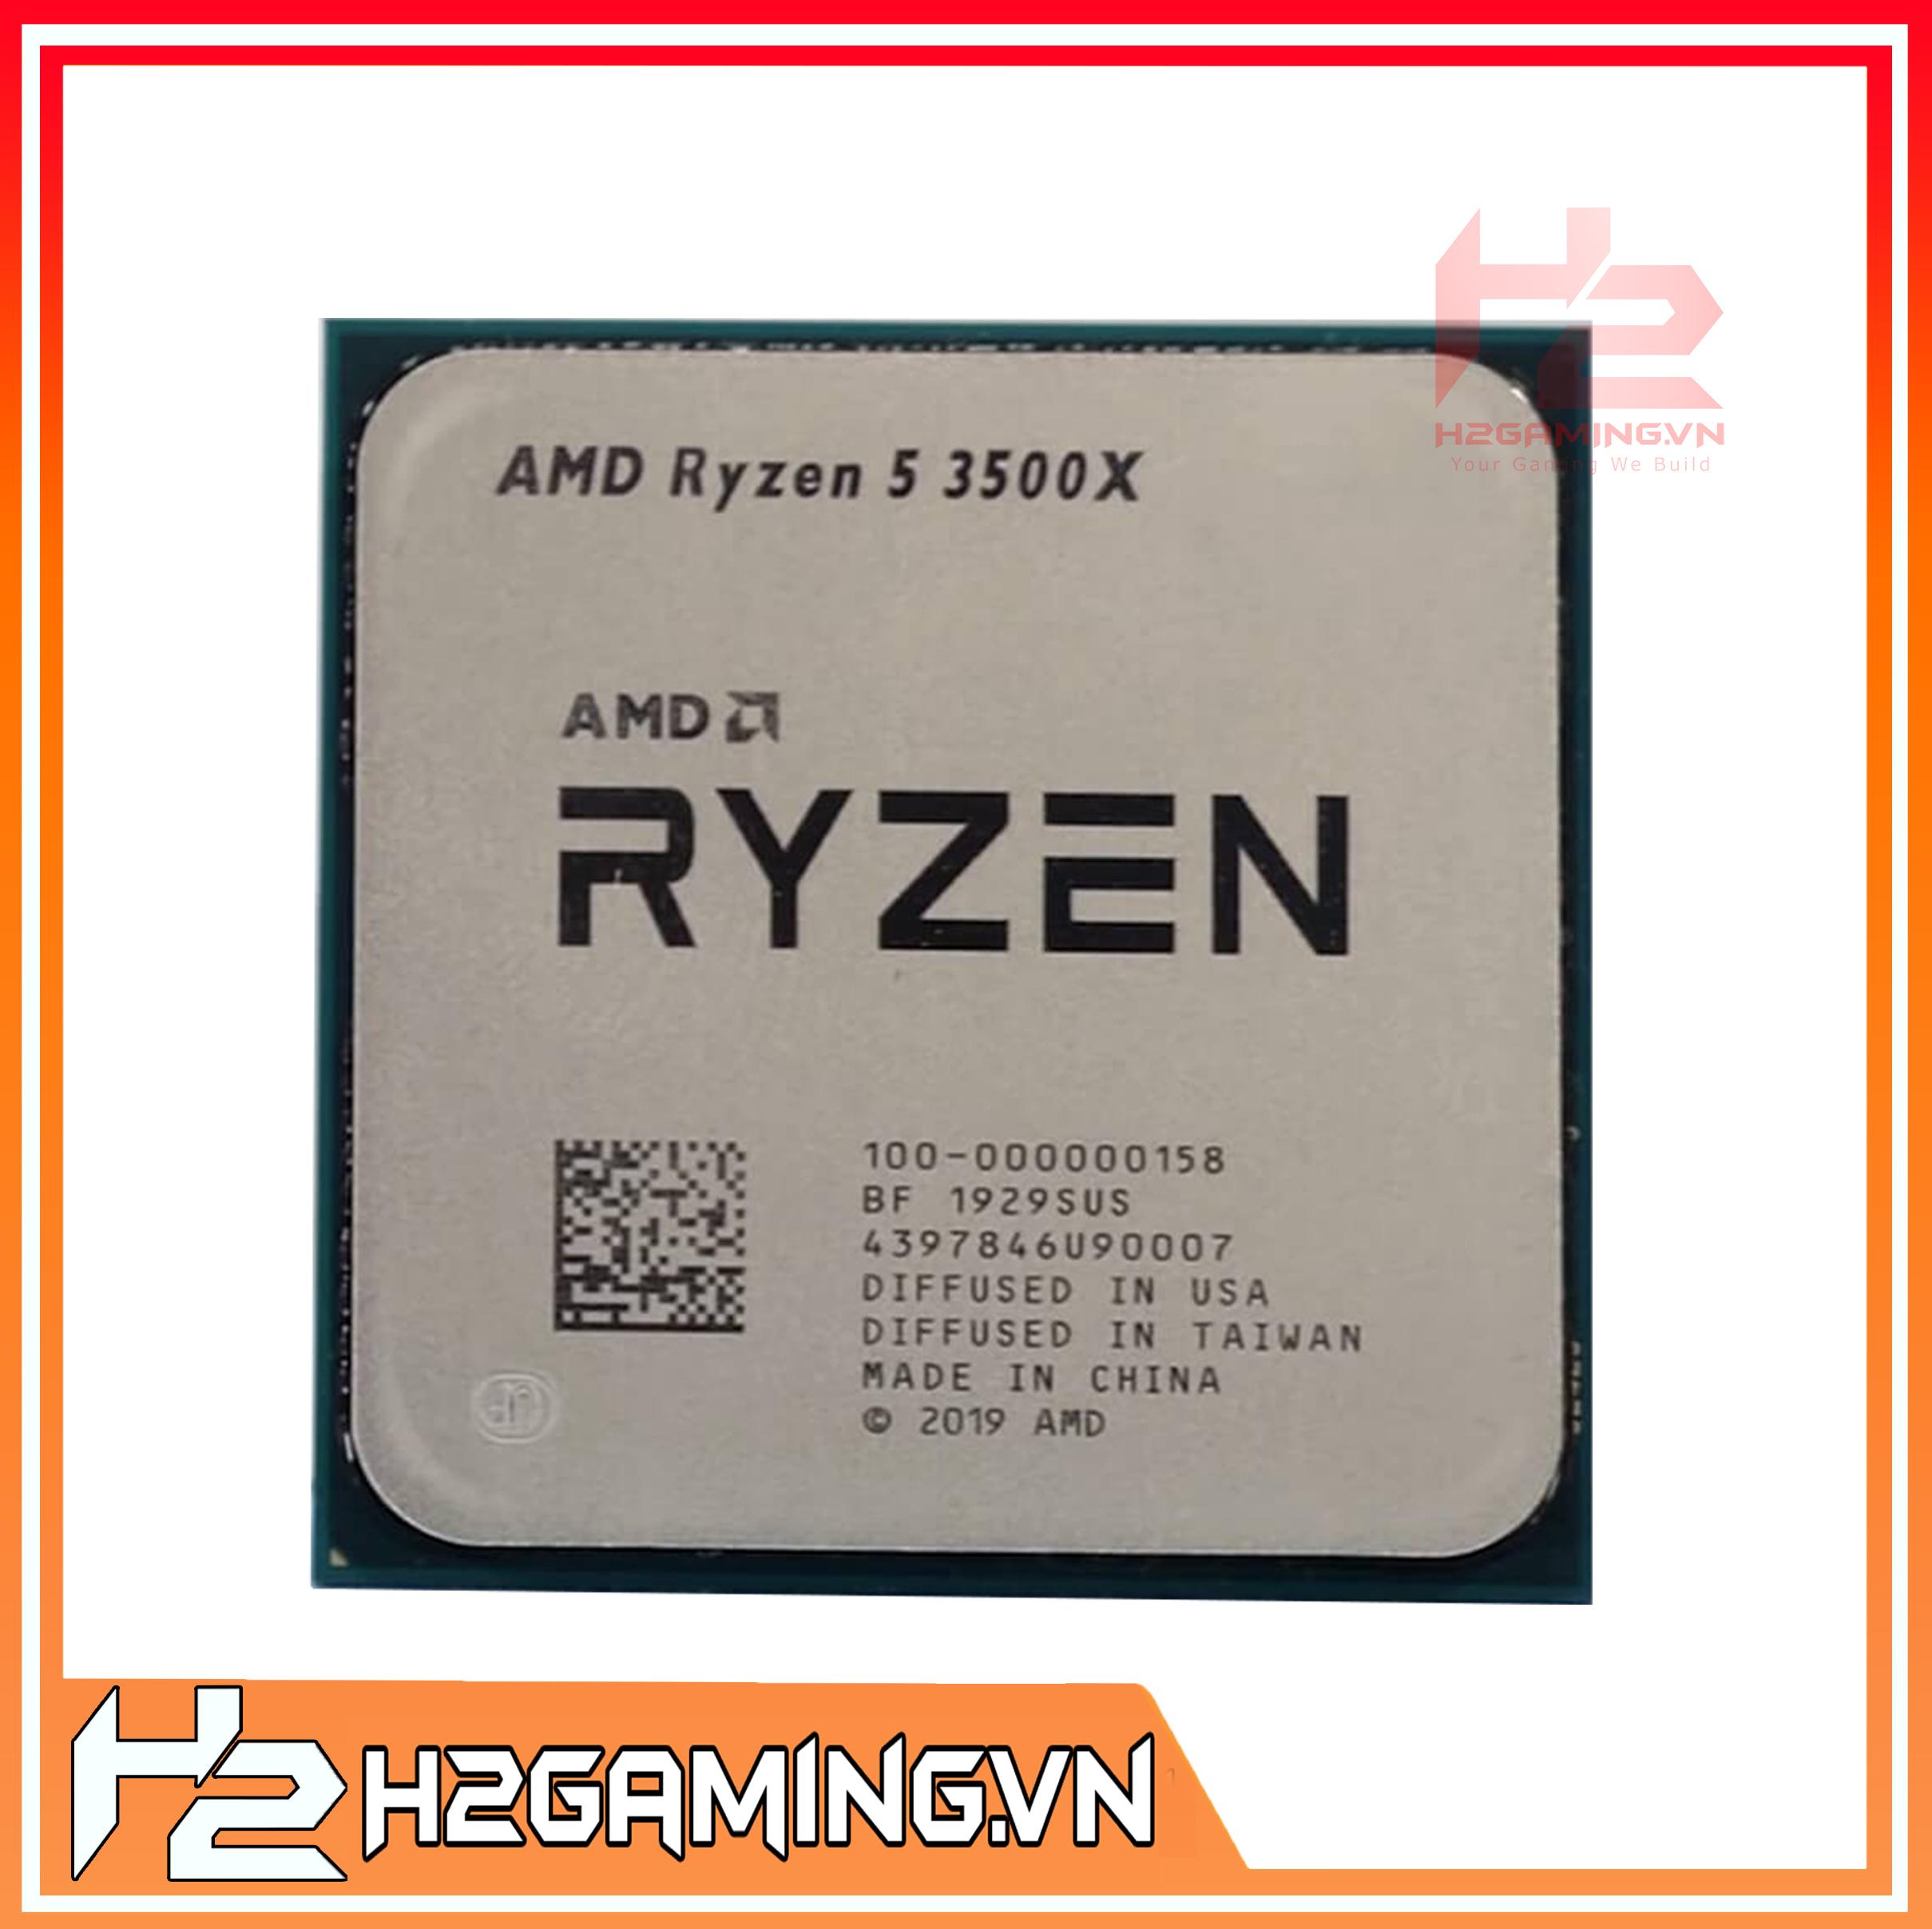 Ryzen_3500X_2